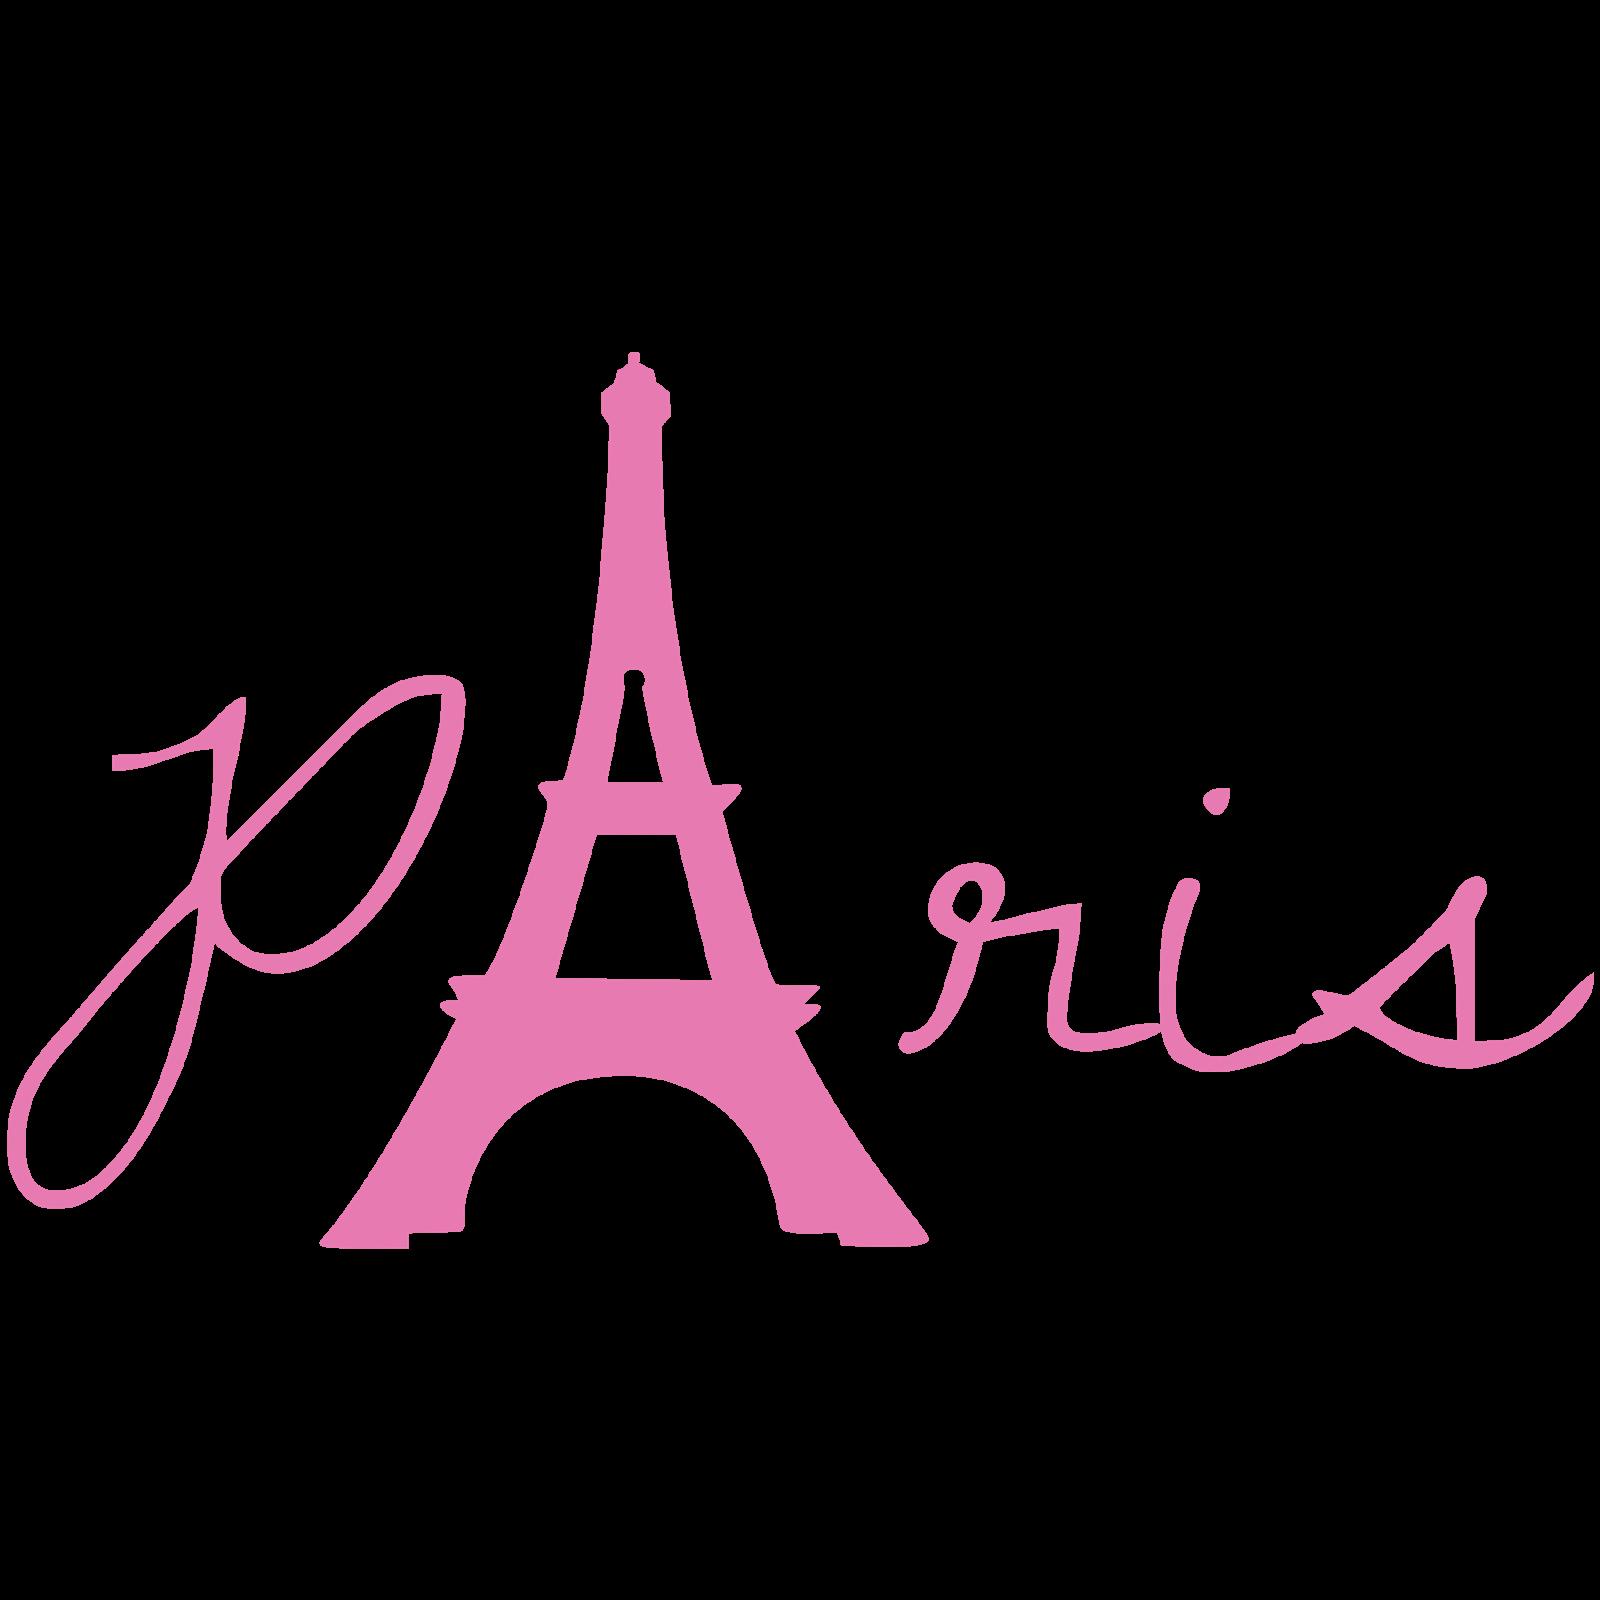 Sexy oh my fiesta. Paris clipart lady paris